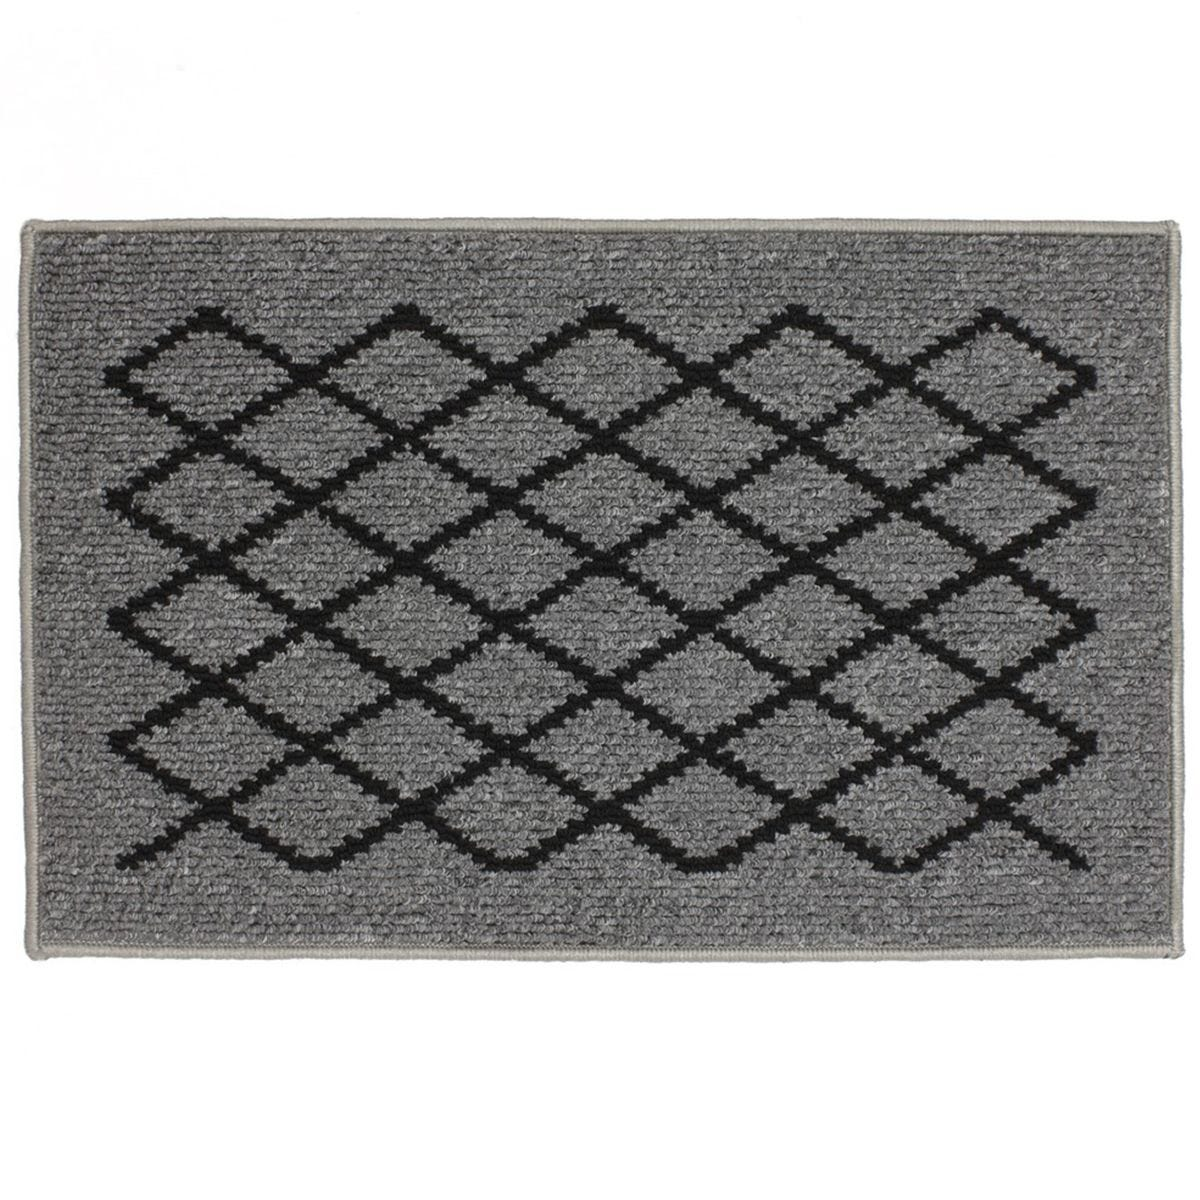 JVL 50x80cm Bergamo Doormat - Grey/Black